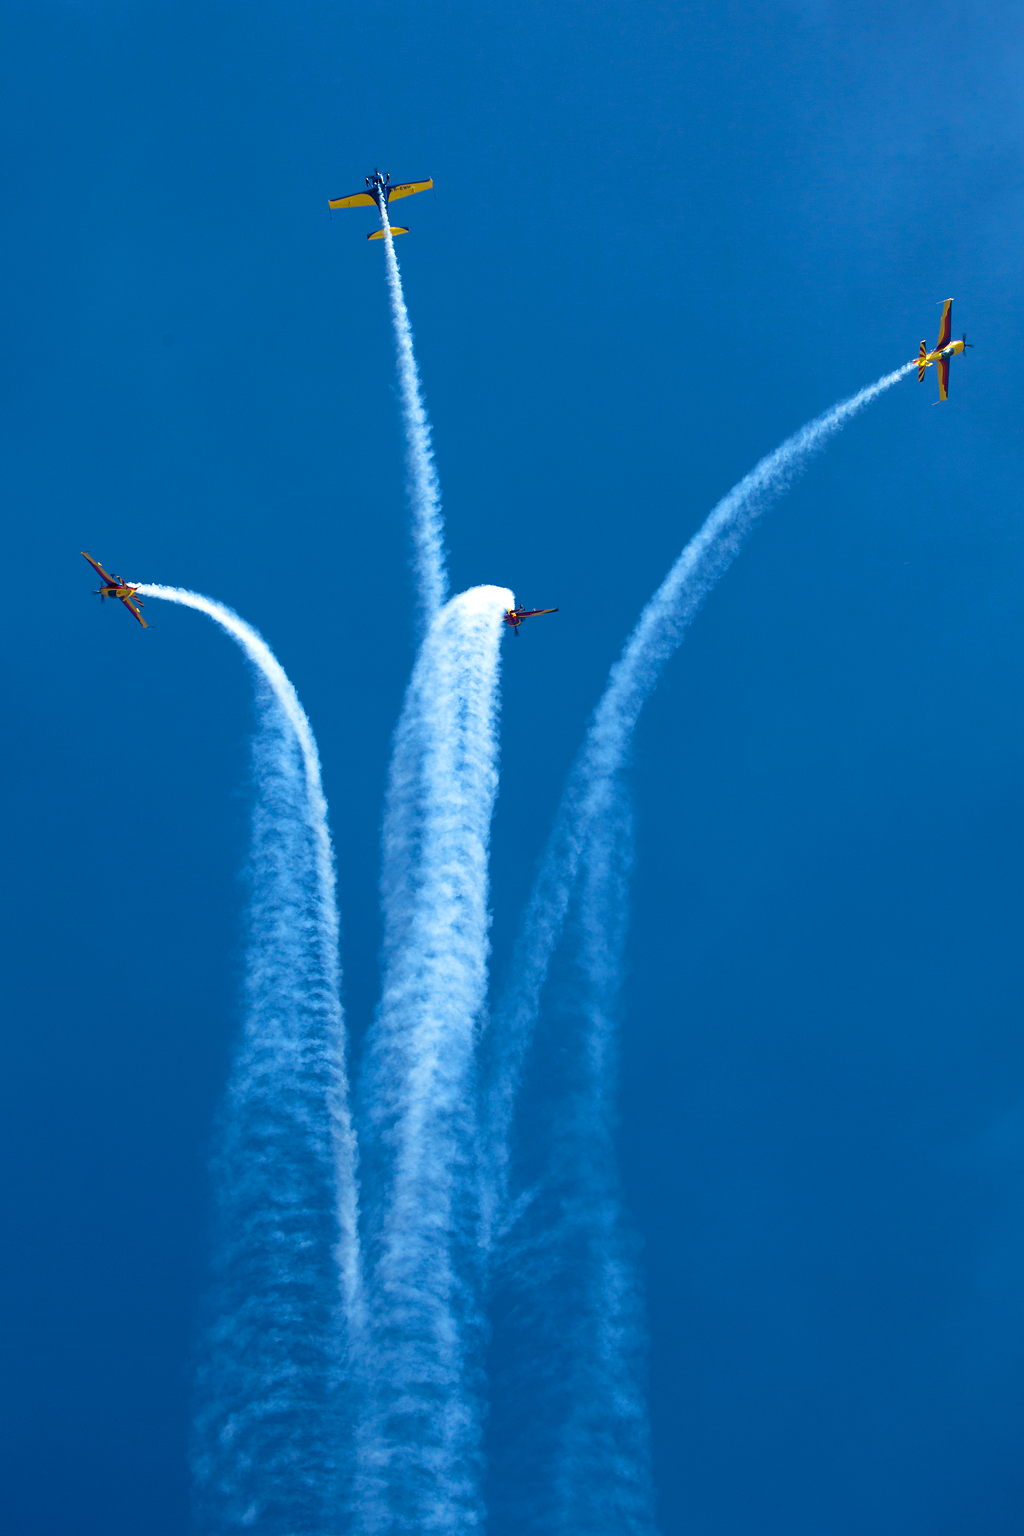 Cluj Napoca Airshow - 5 mai 2012 - Poze - Pagina 2 20